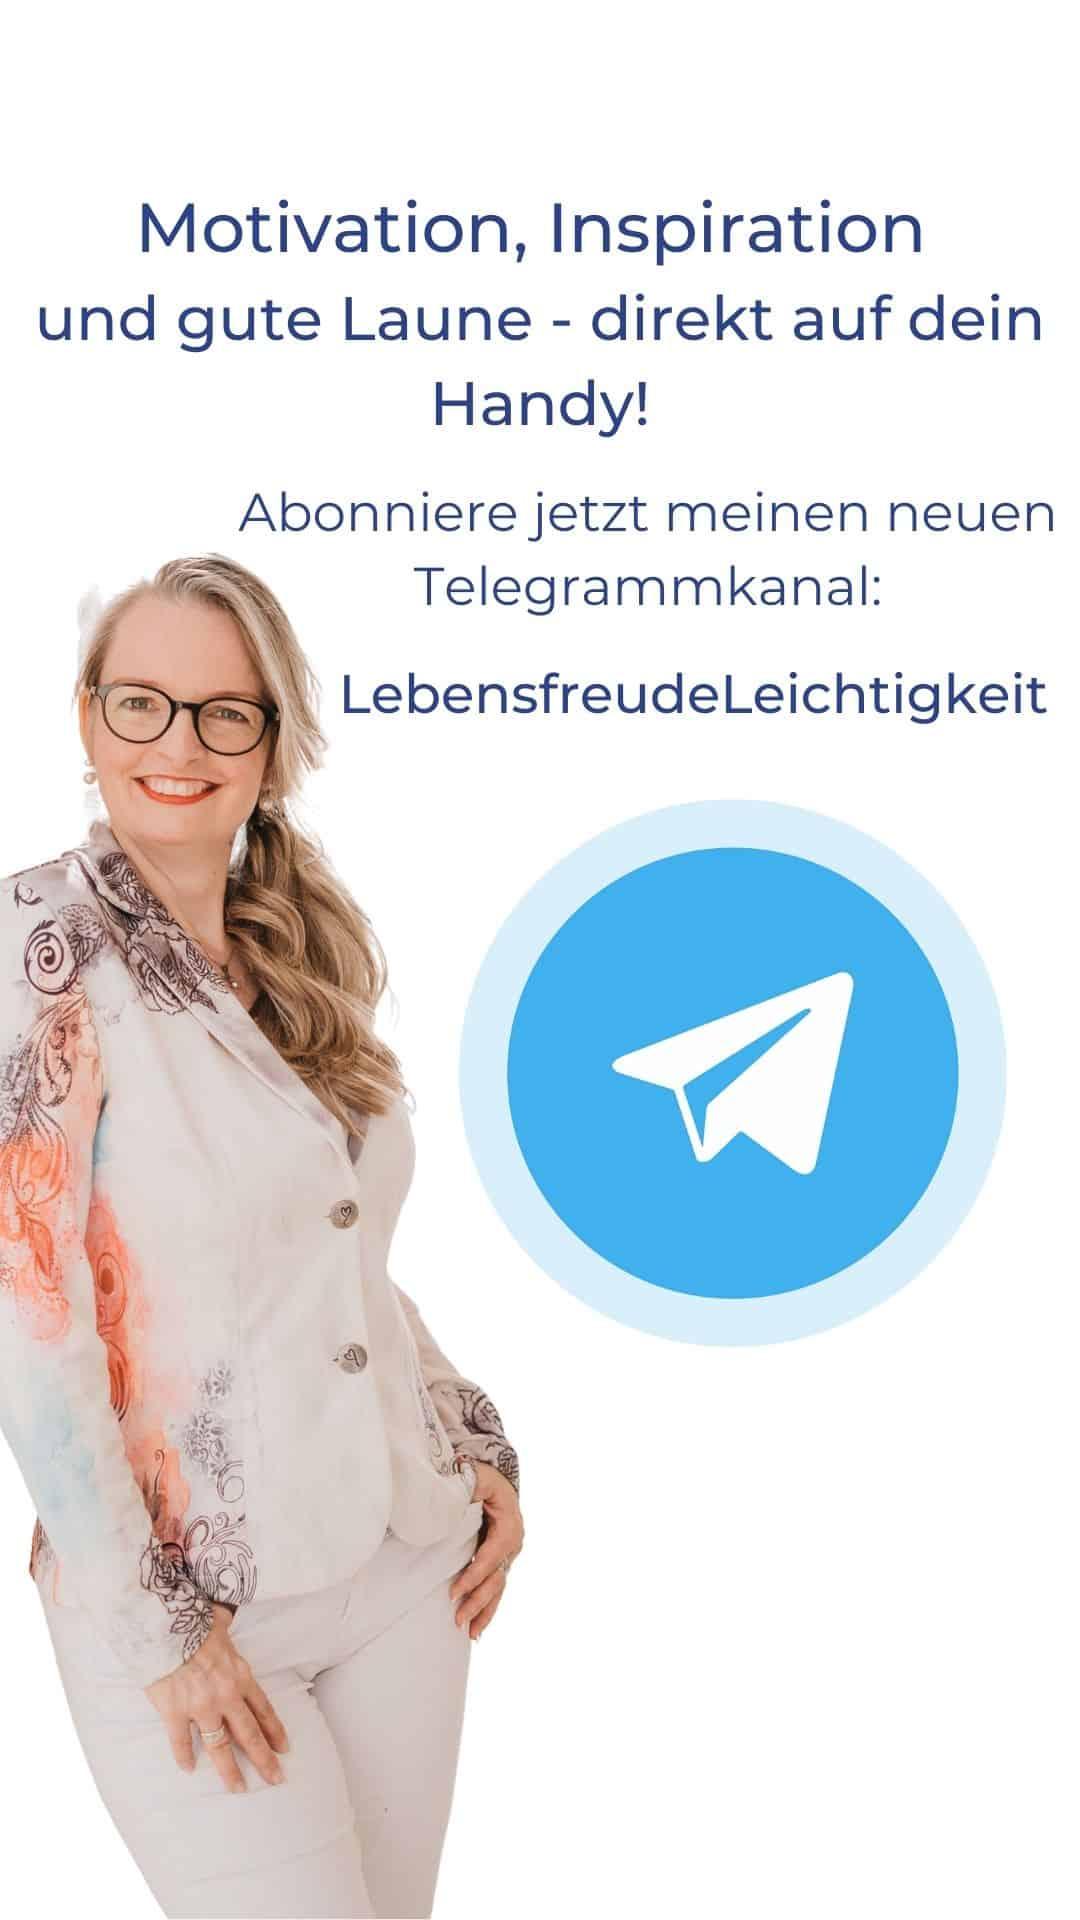 https://danielakreissig.de/wp-content/uploads/2021/09/Telegramm_Story_1-1.jpg